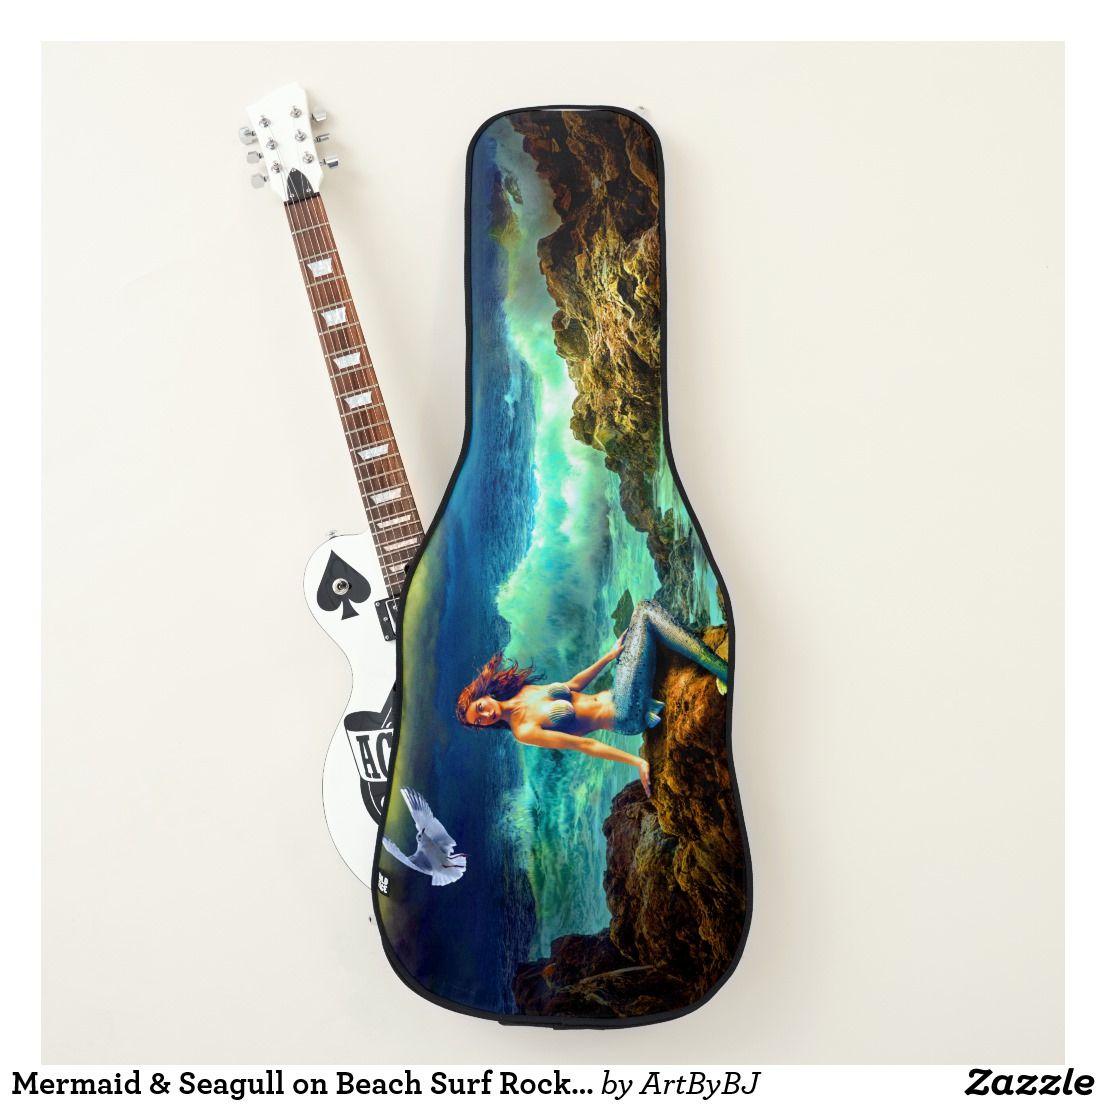 Mermaid Electric Guitar Case Great New Range Of Electric Guitar Cases Acoustic Guitar Cases To Buy Guitar Case Acoustic Guitar Case Electric Guitar Case